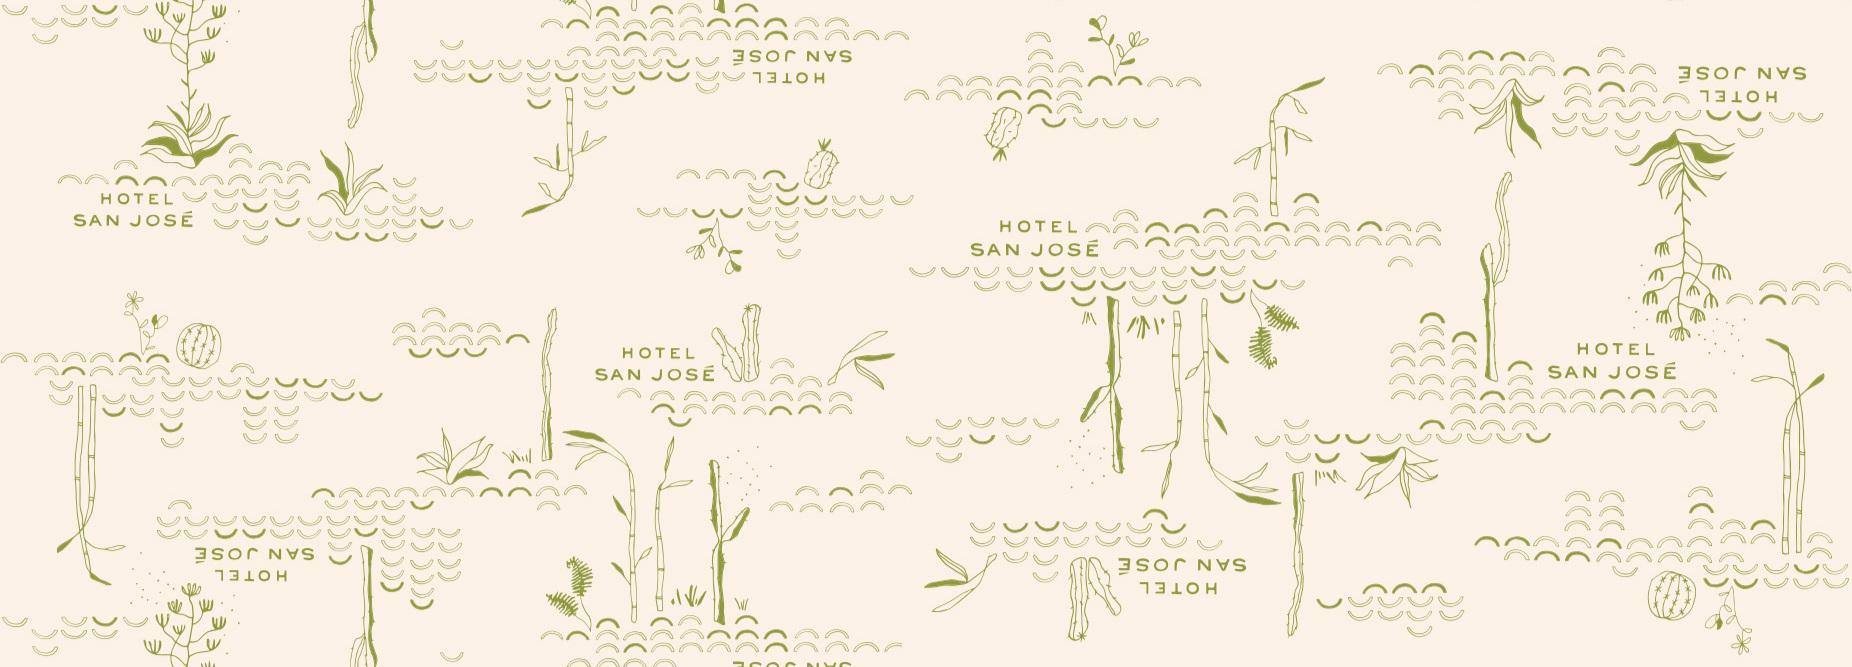 HotelSanJosePatternBig.jpg